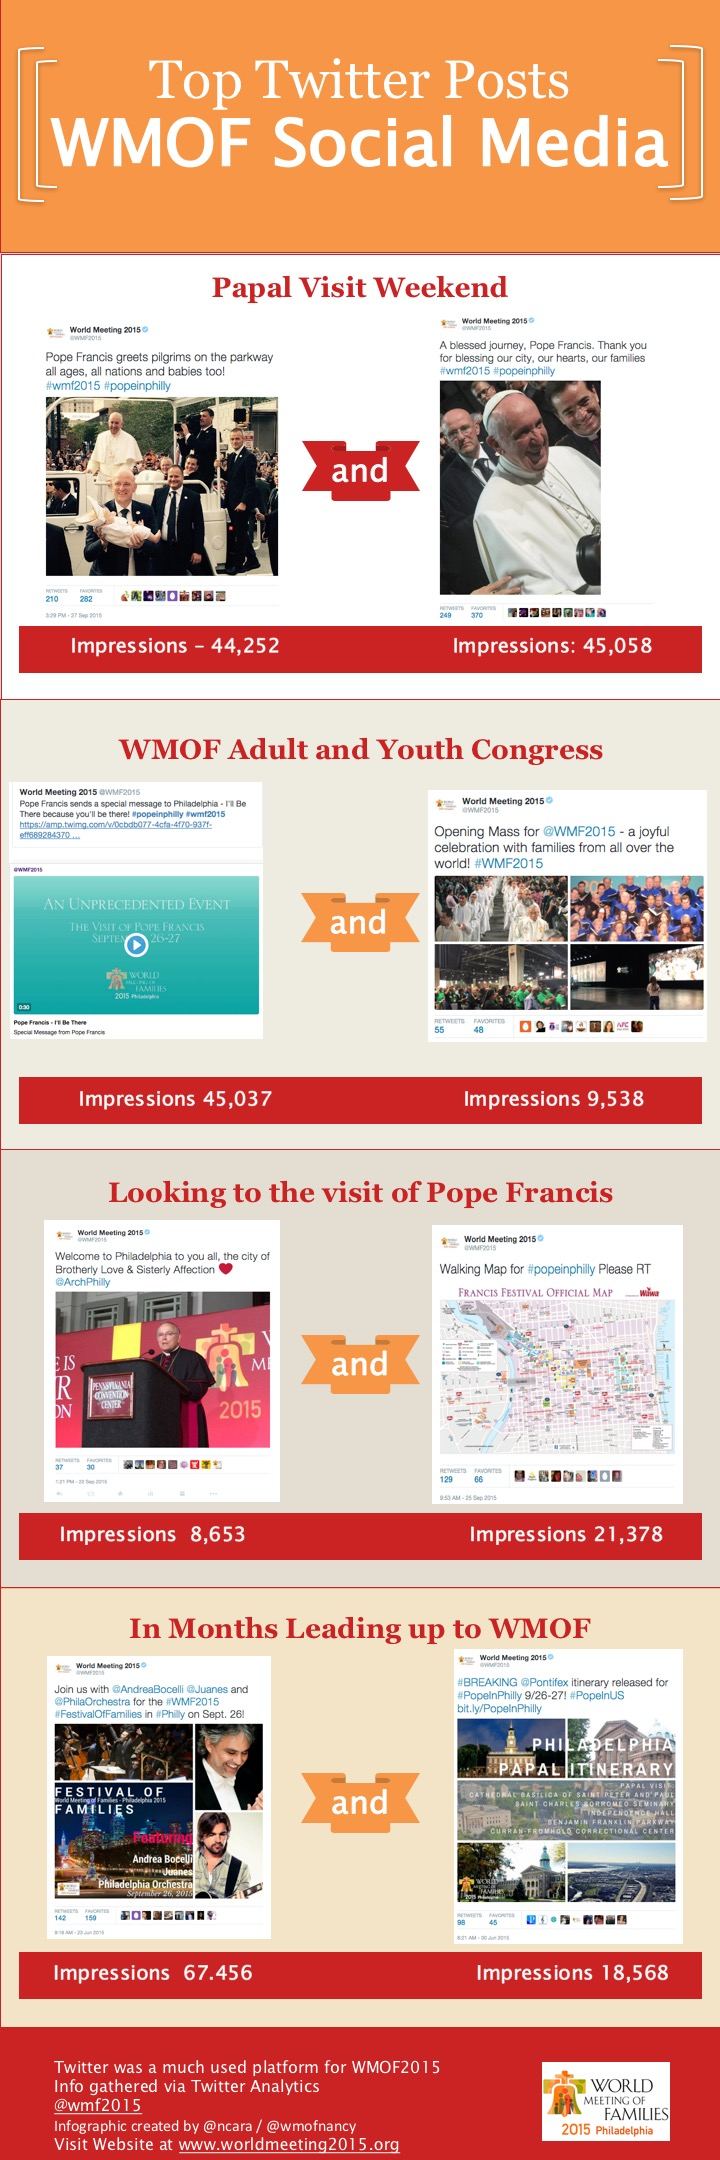 Top Tweets - One Week WMOF and Visit of Pope Francis